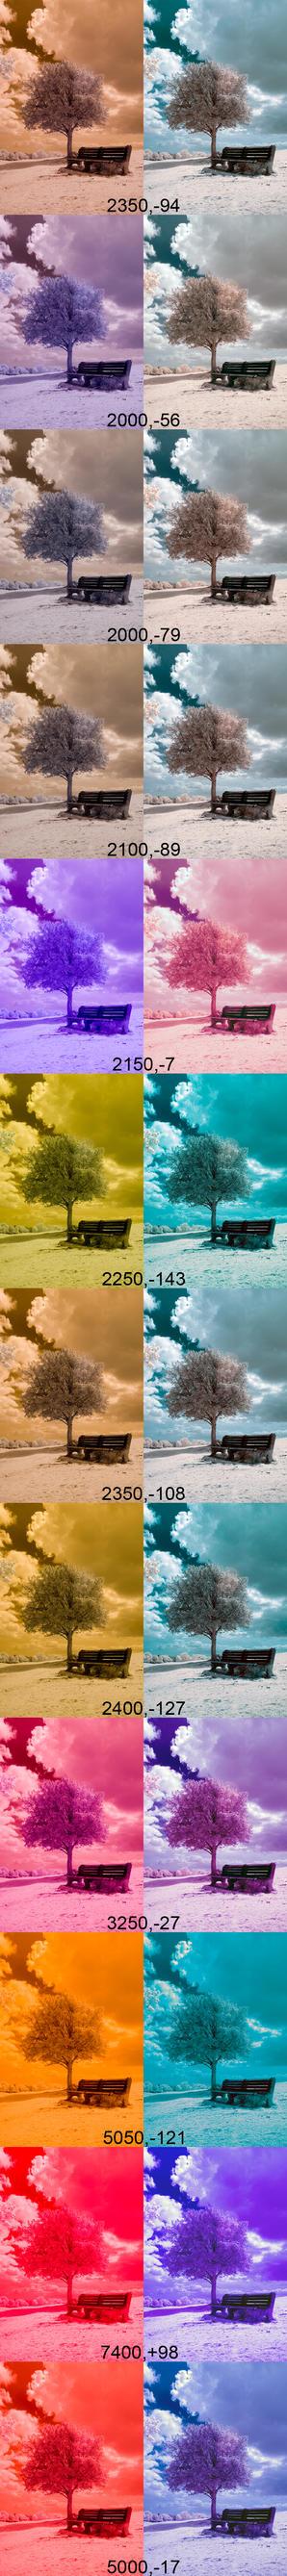 Infrared colour profiles by monkeyheadmushroom